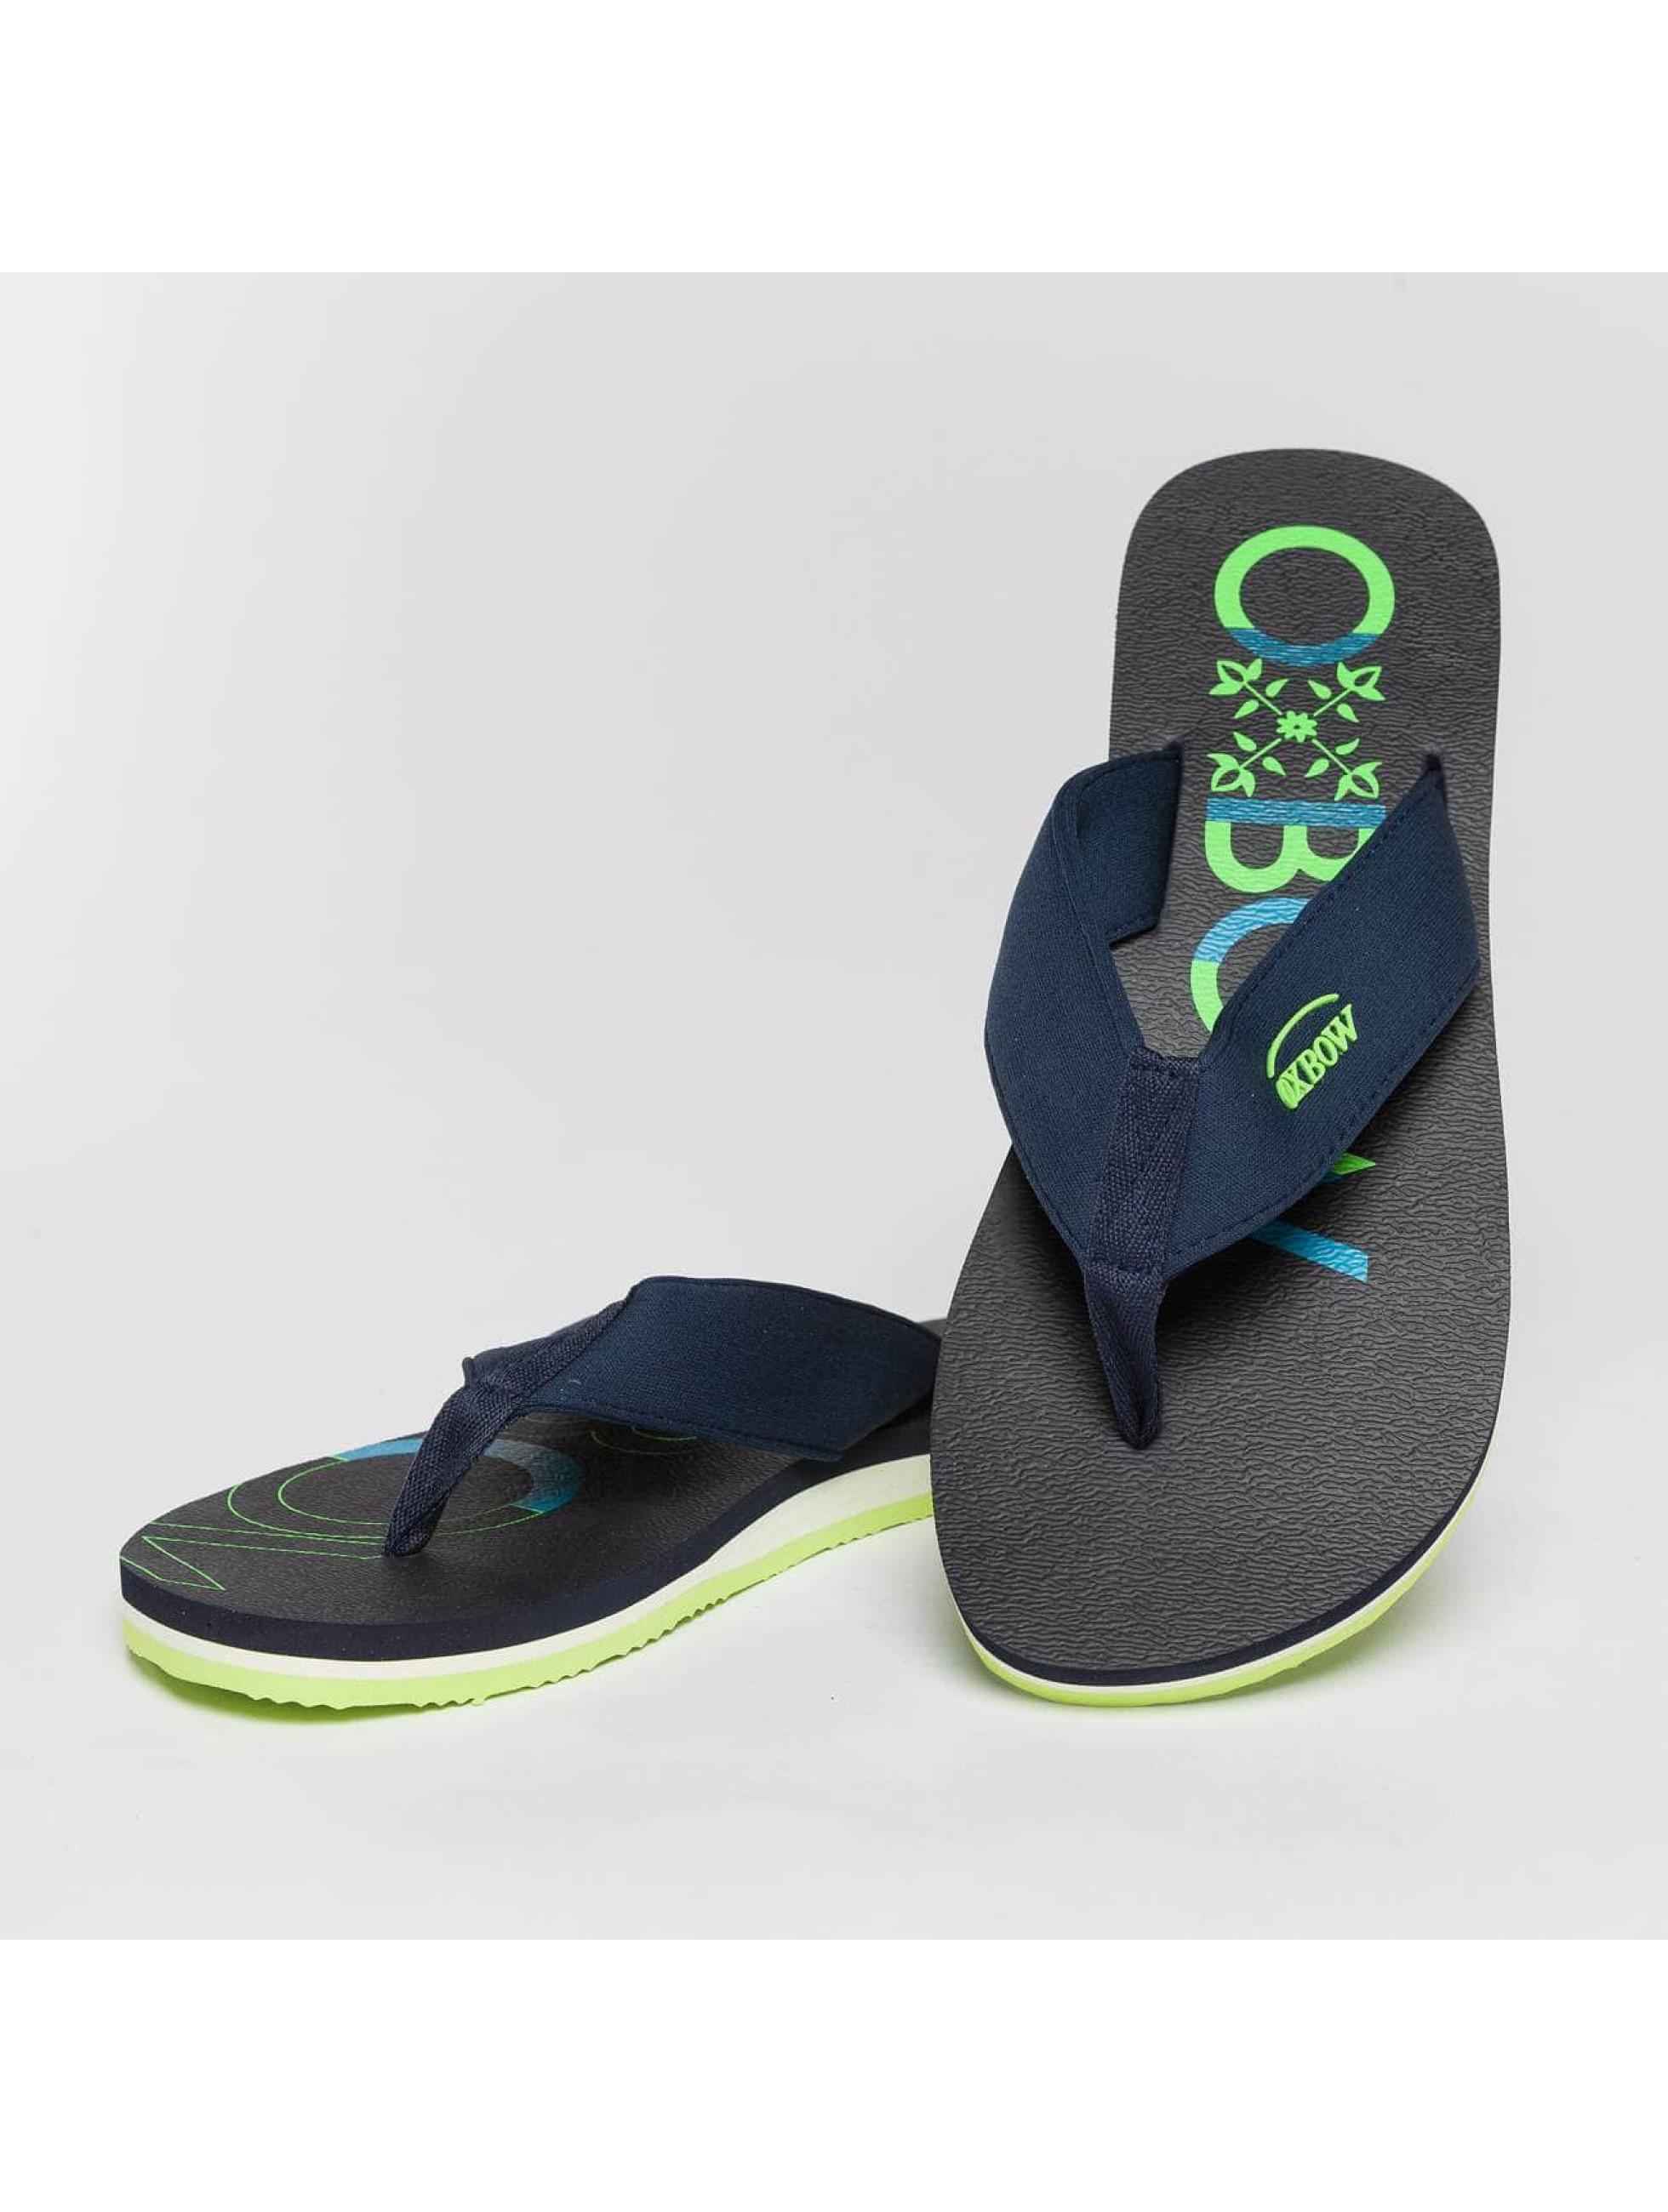 Oxbow Sandals Vigliano Printed EVA blue